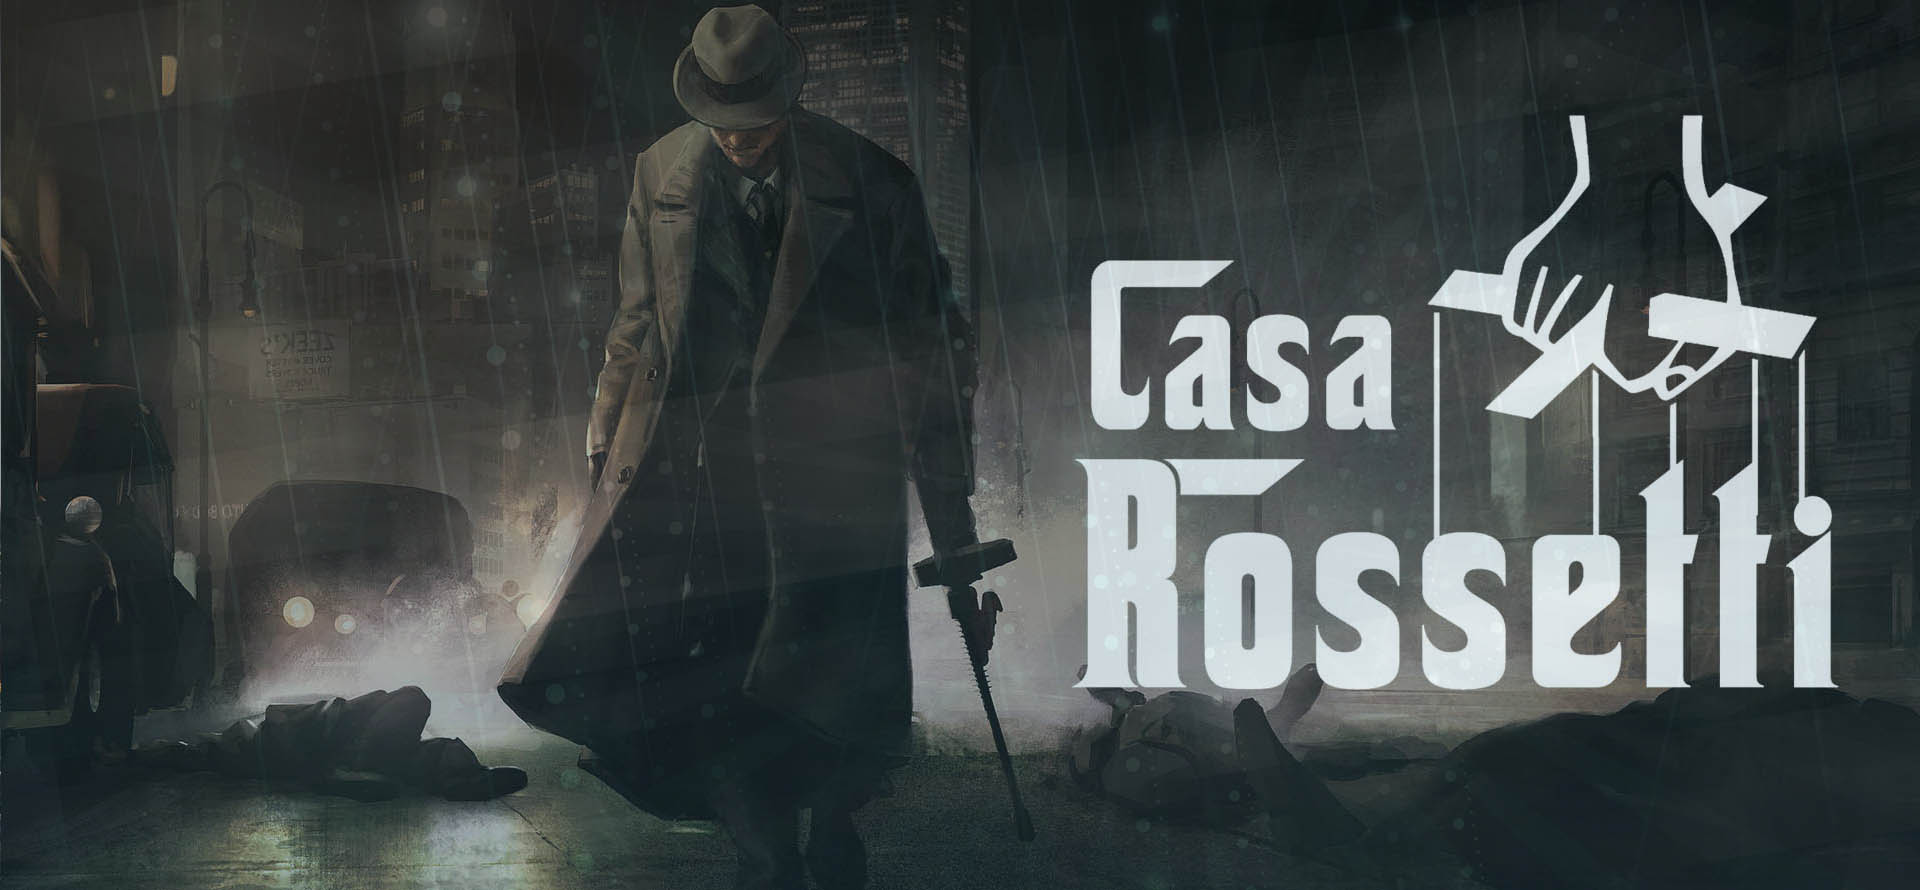 Casa Rossetti